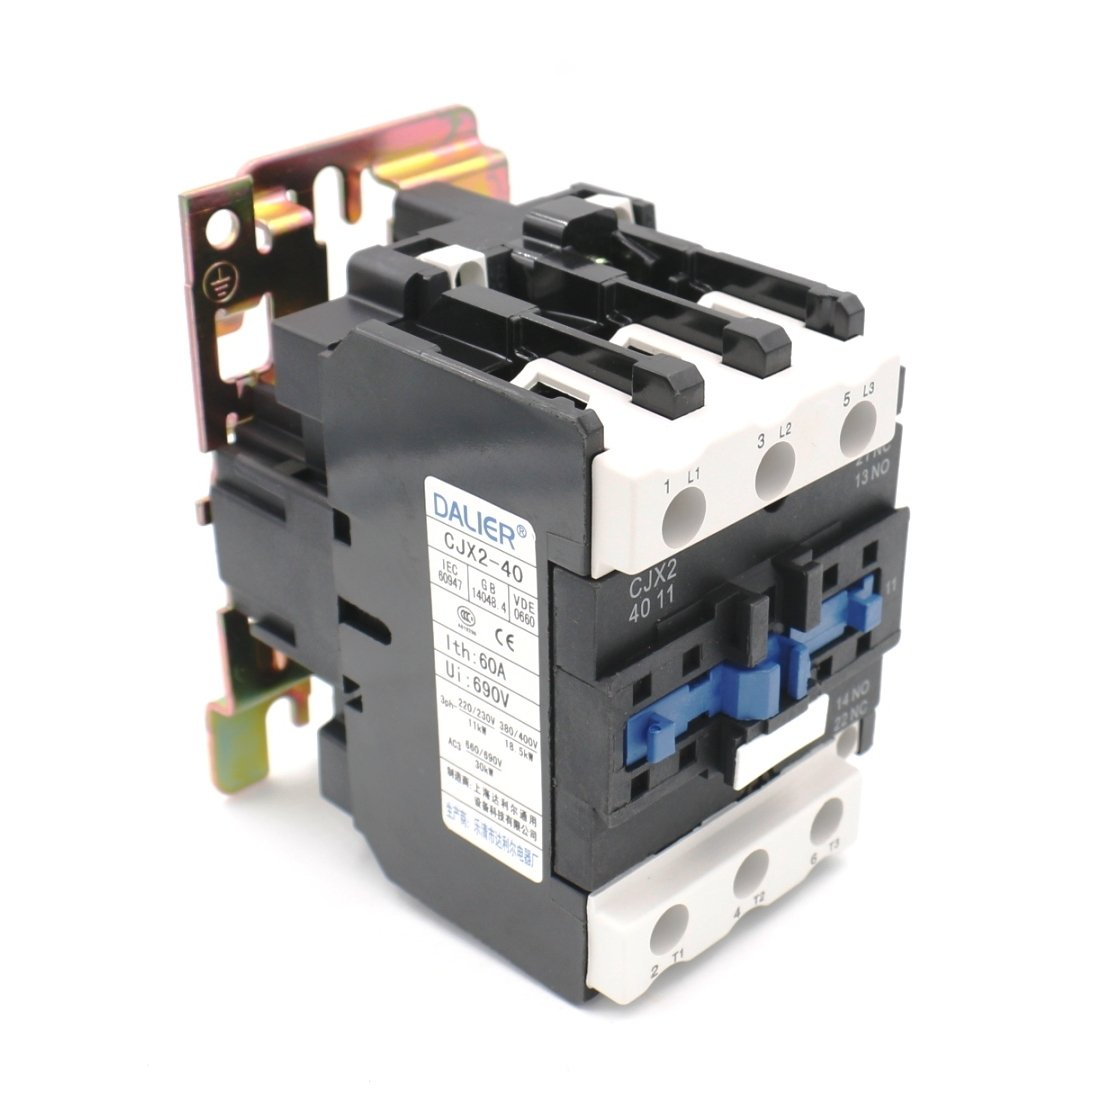 Baomain Cjx2 4011 220v 50 60hz Ac Contactor 40amp 3 Phase Pole No Harga Relay Nc Industrial Scientific